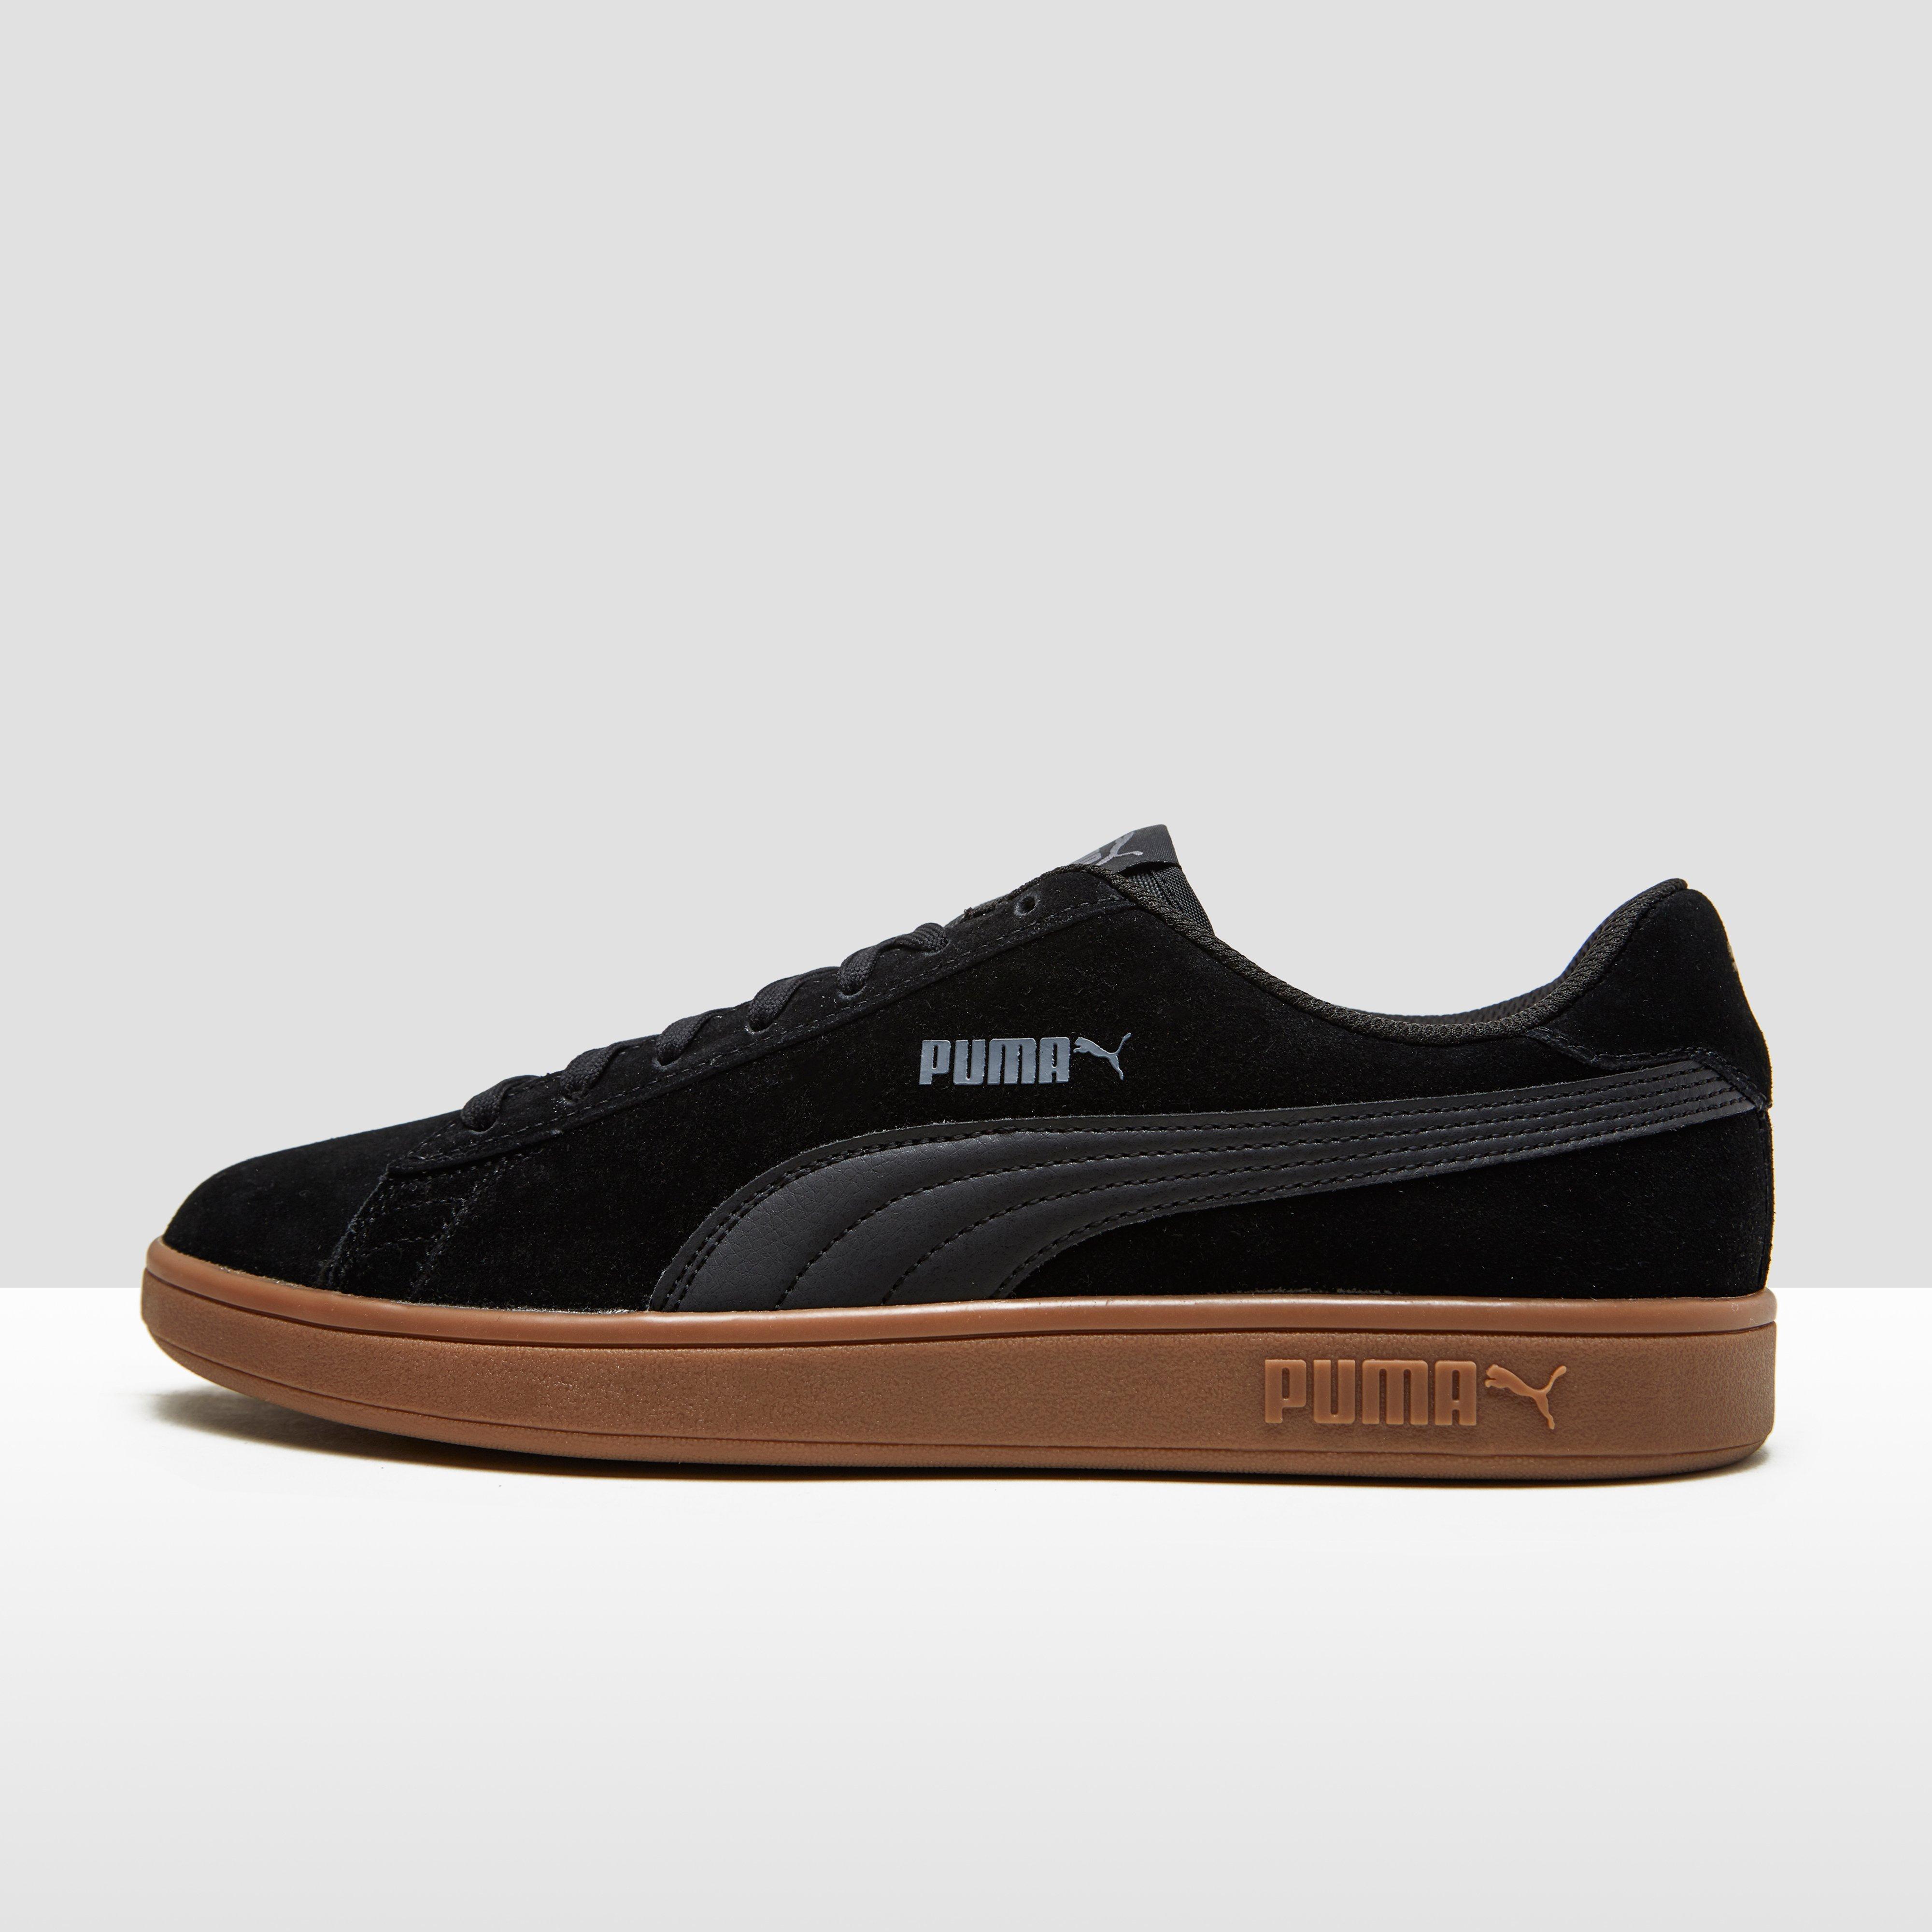 Pumas - Smash Baskets V2 - Hommes - Chaussures - Noir - 40,5